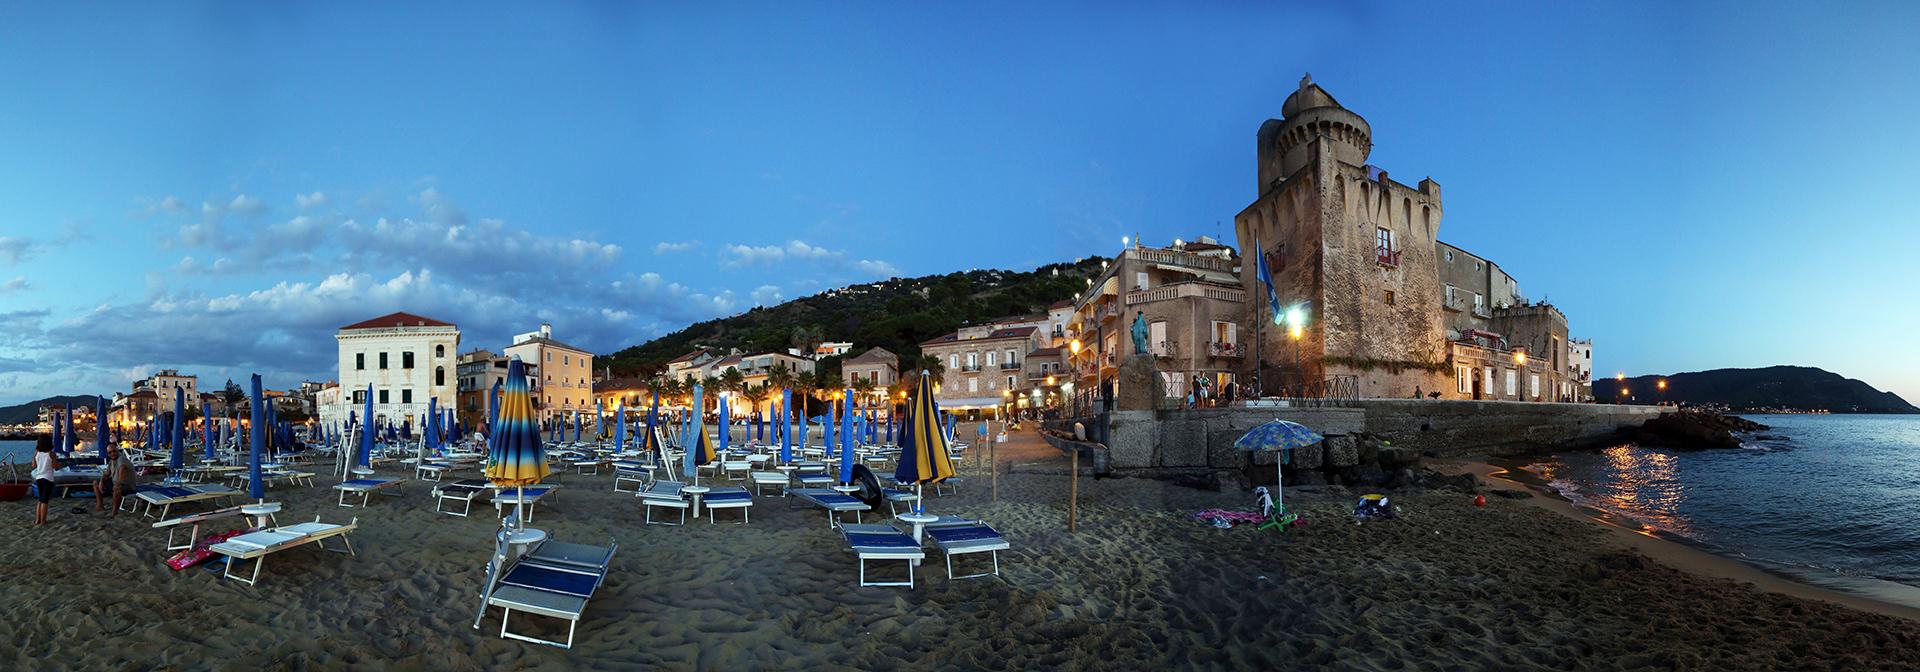 Hotel Santa Maria di Castellabate Cilento Italia